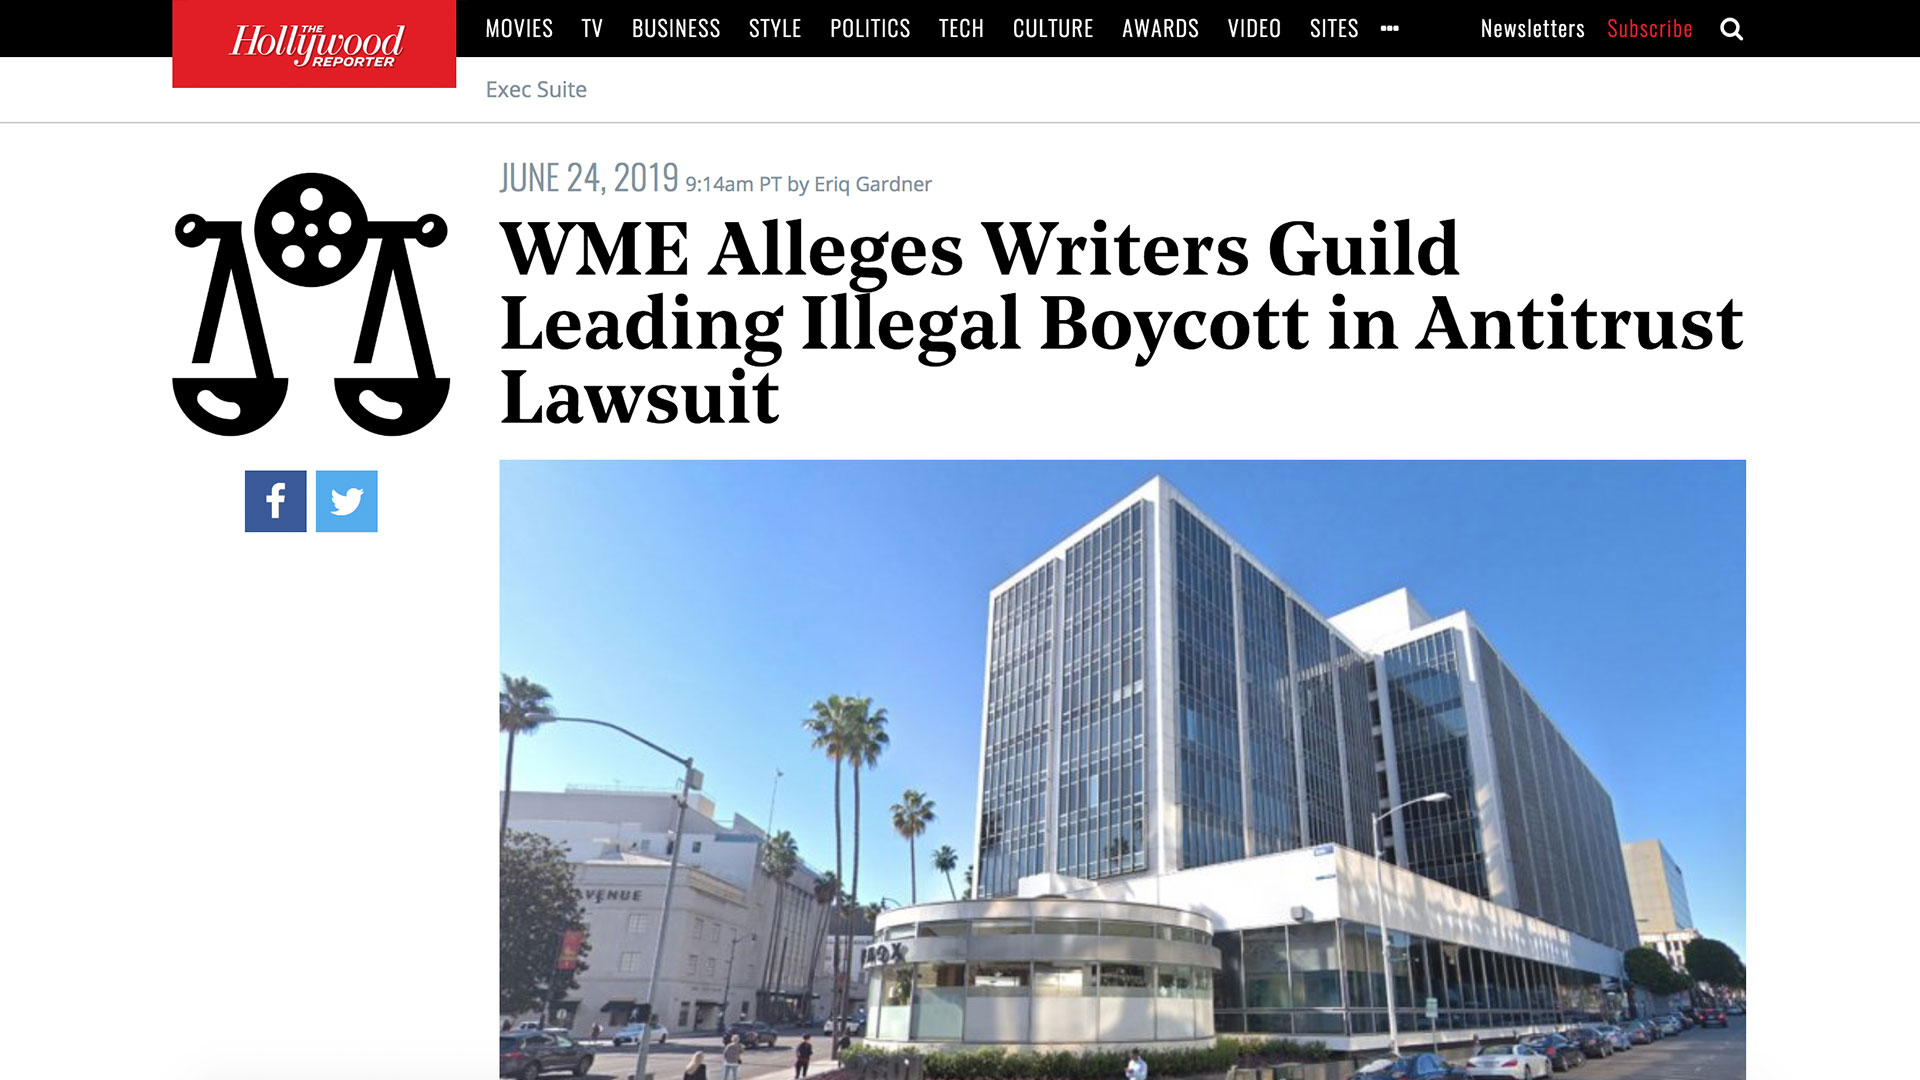 Fairness Rocks News WME Alleges Writers Guild Leading Illegal Boycott in Antitrust Lawsuit